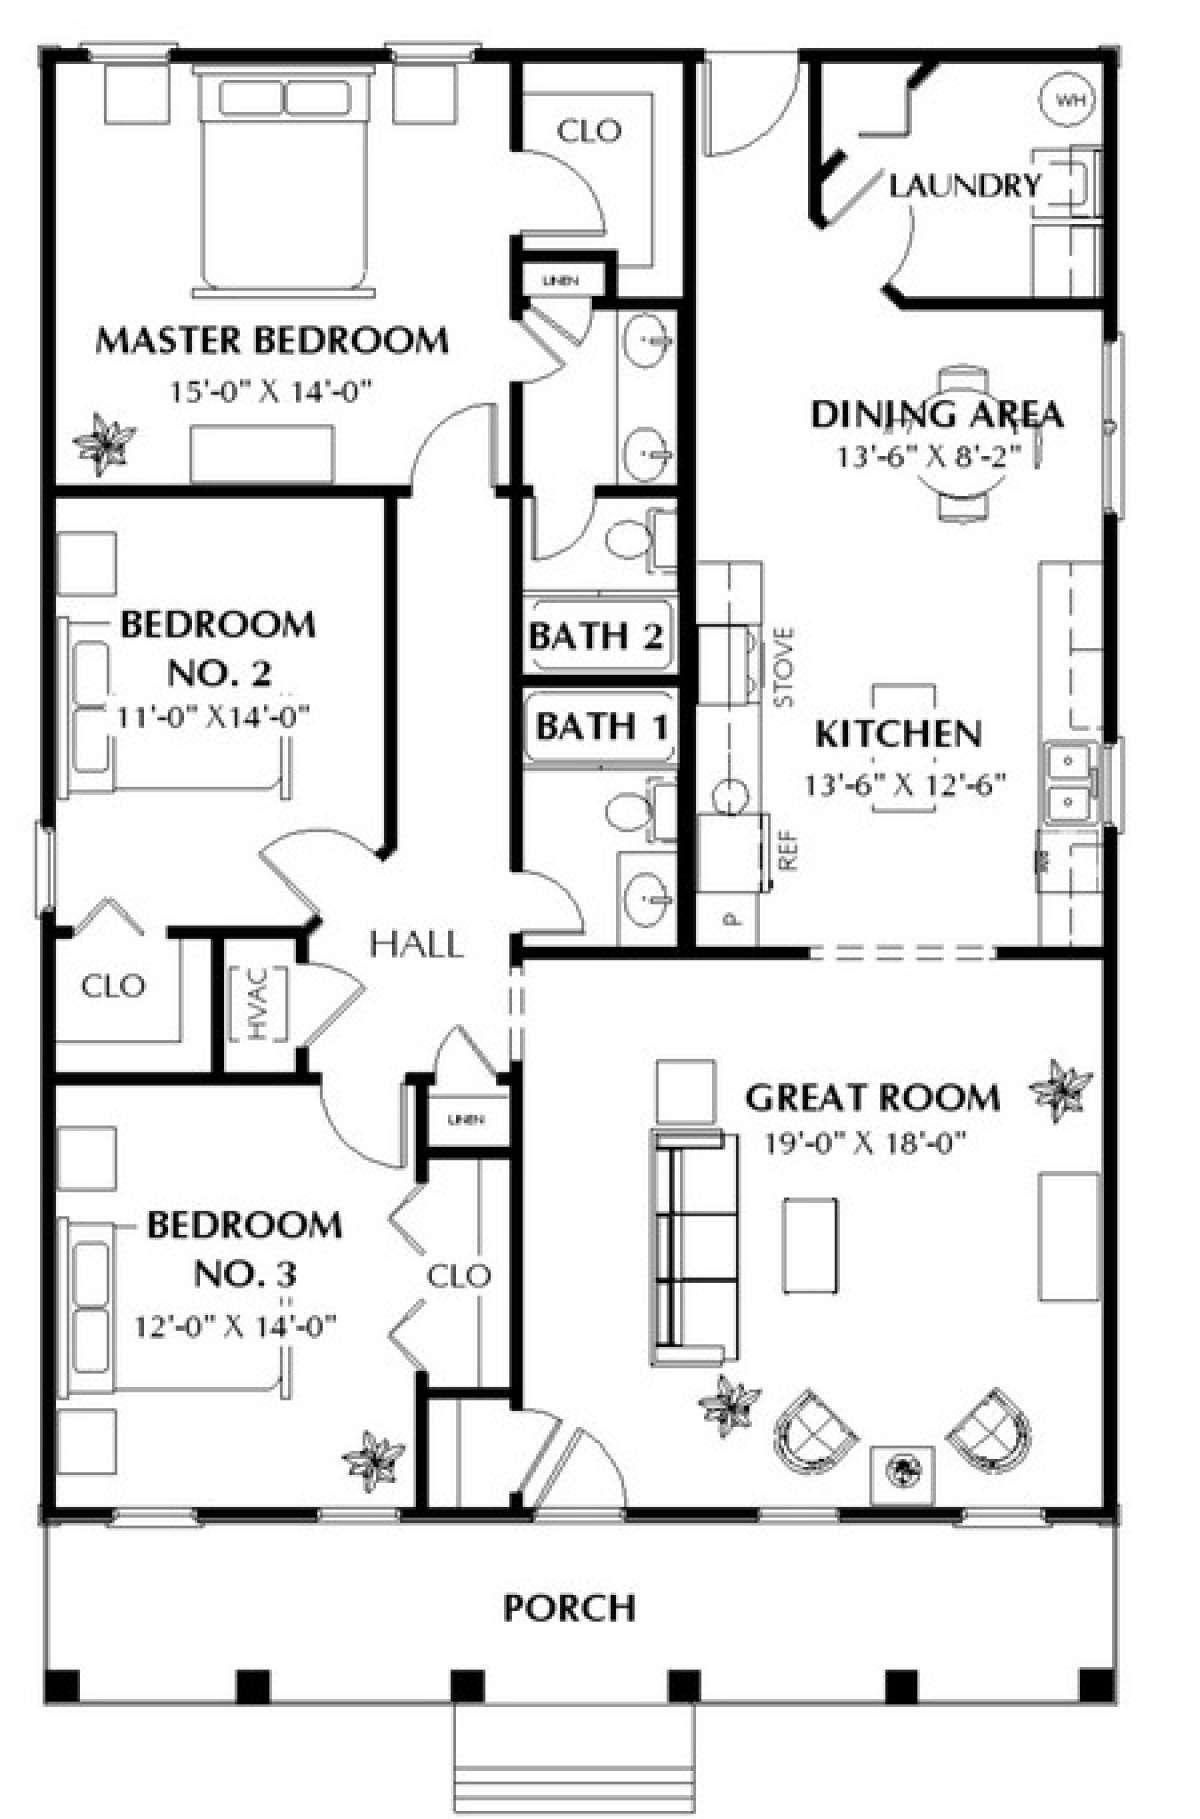 House Plan 177600028 Cottage Plan 1,587 Square Feet, 3